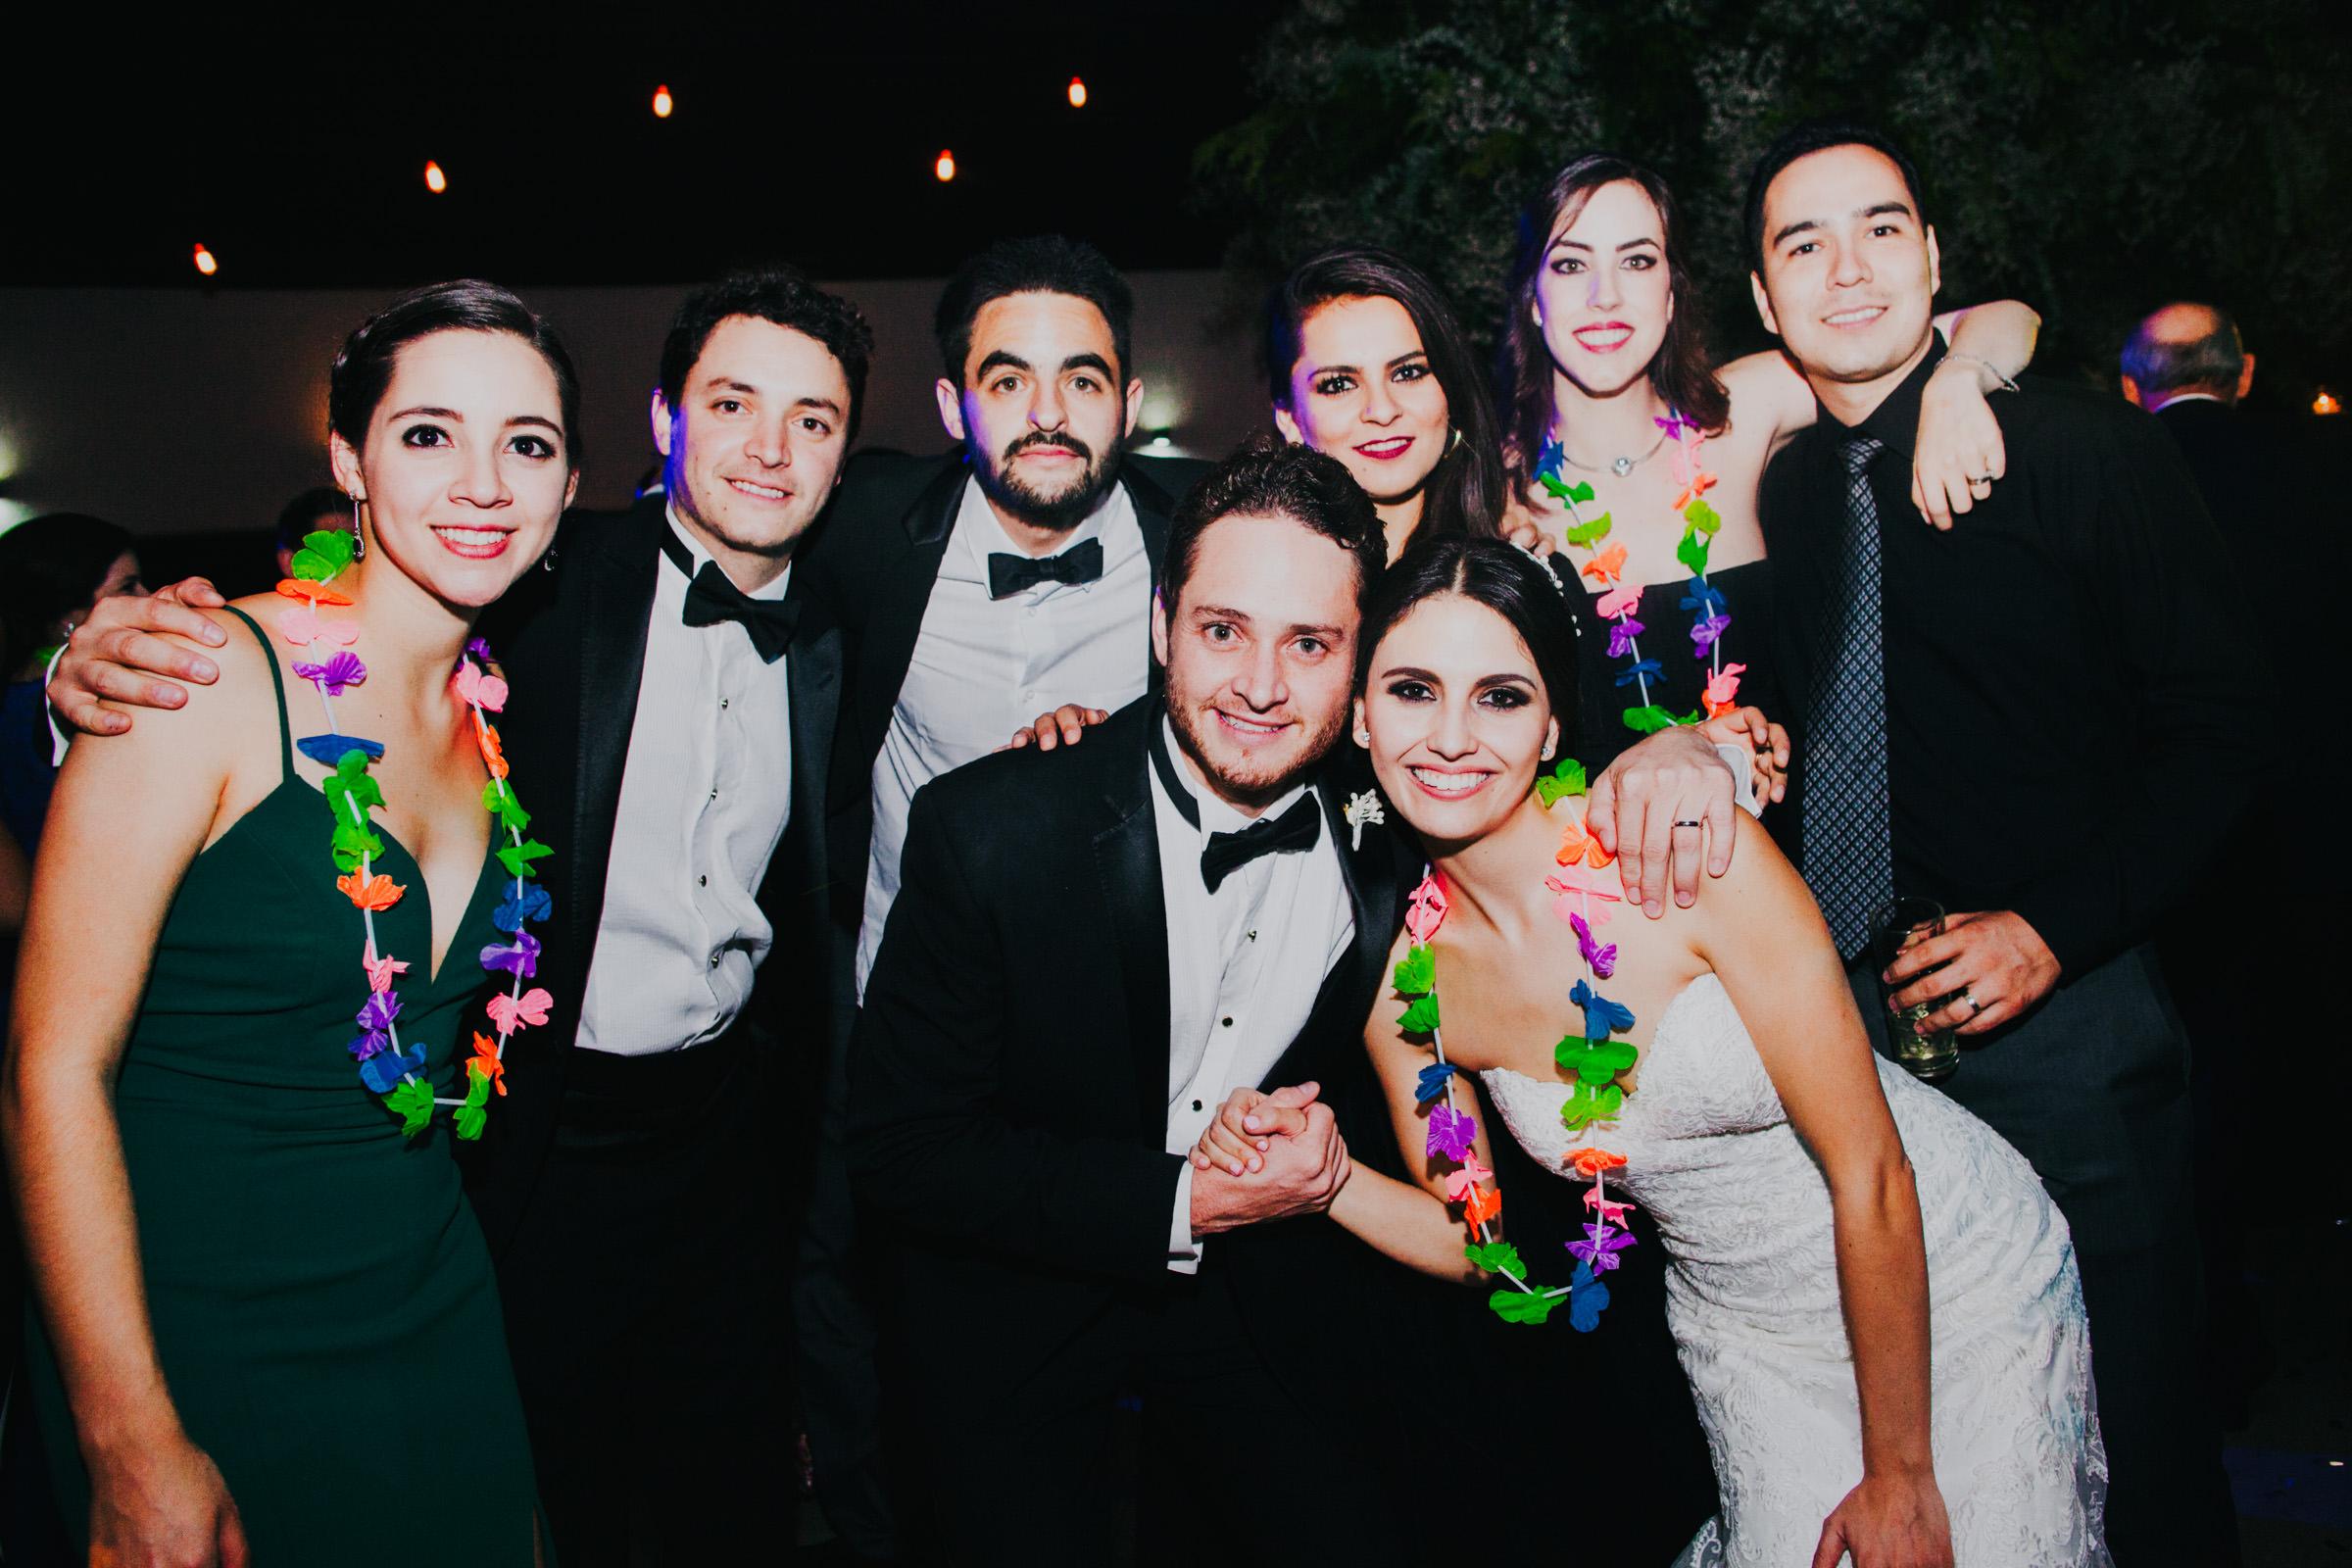 irapuato-boda-fotografia-jardines-alcalde-guanajuato-paulina-juan-pedro--152.jpg